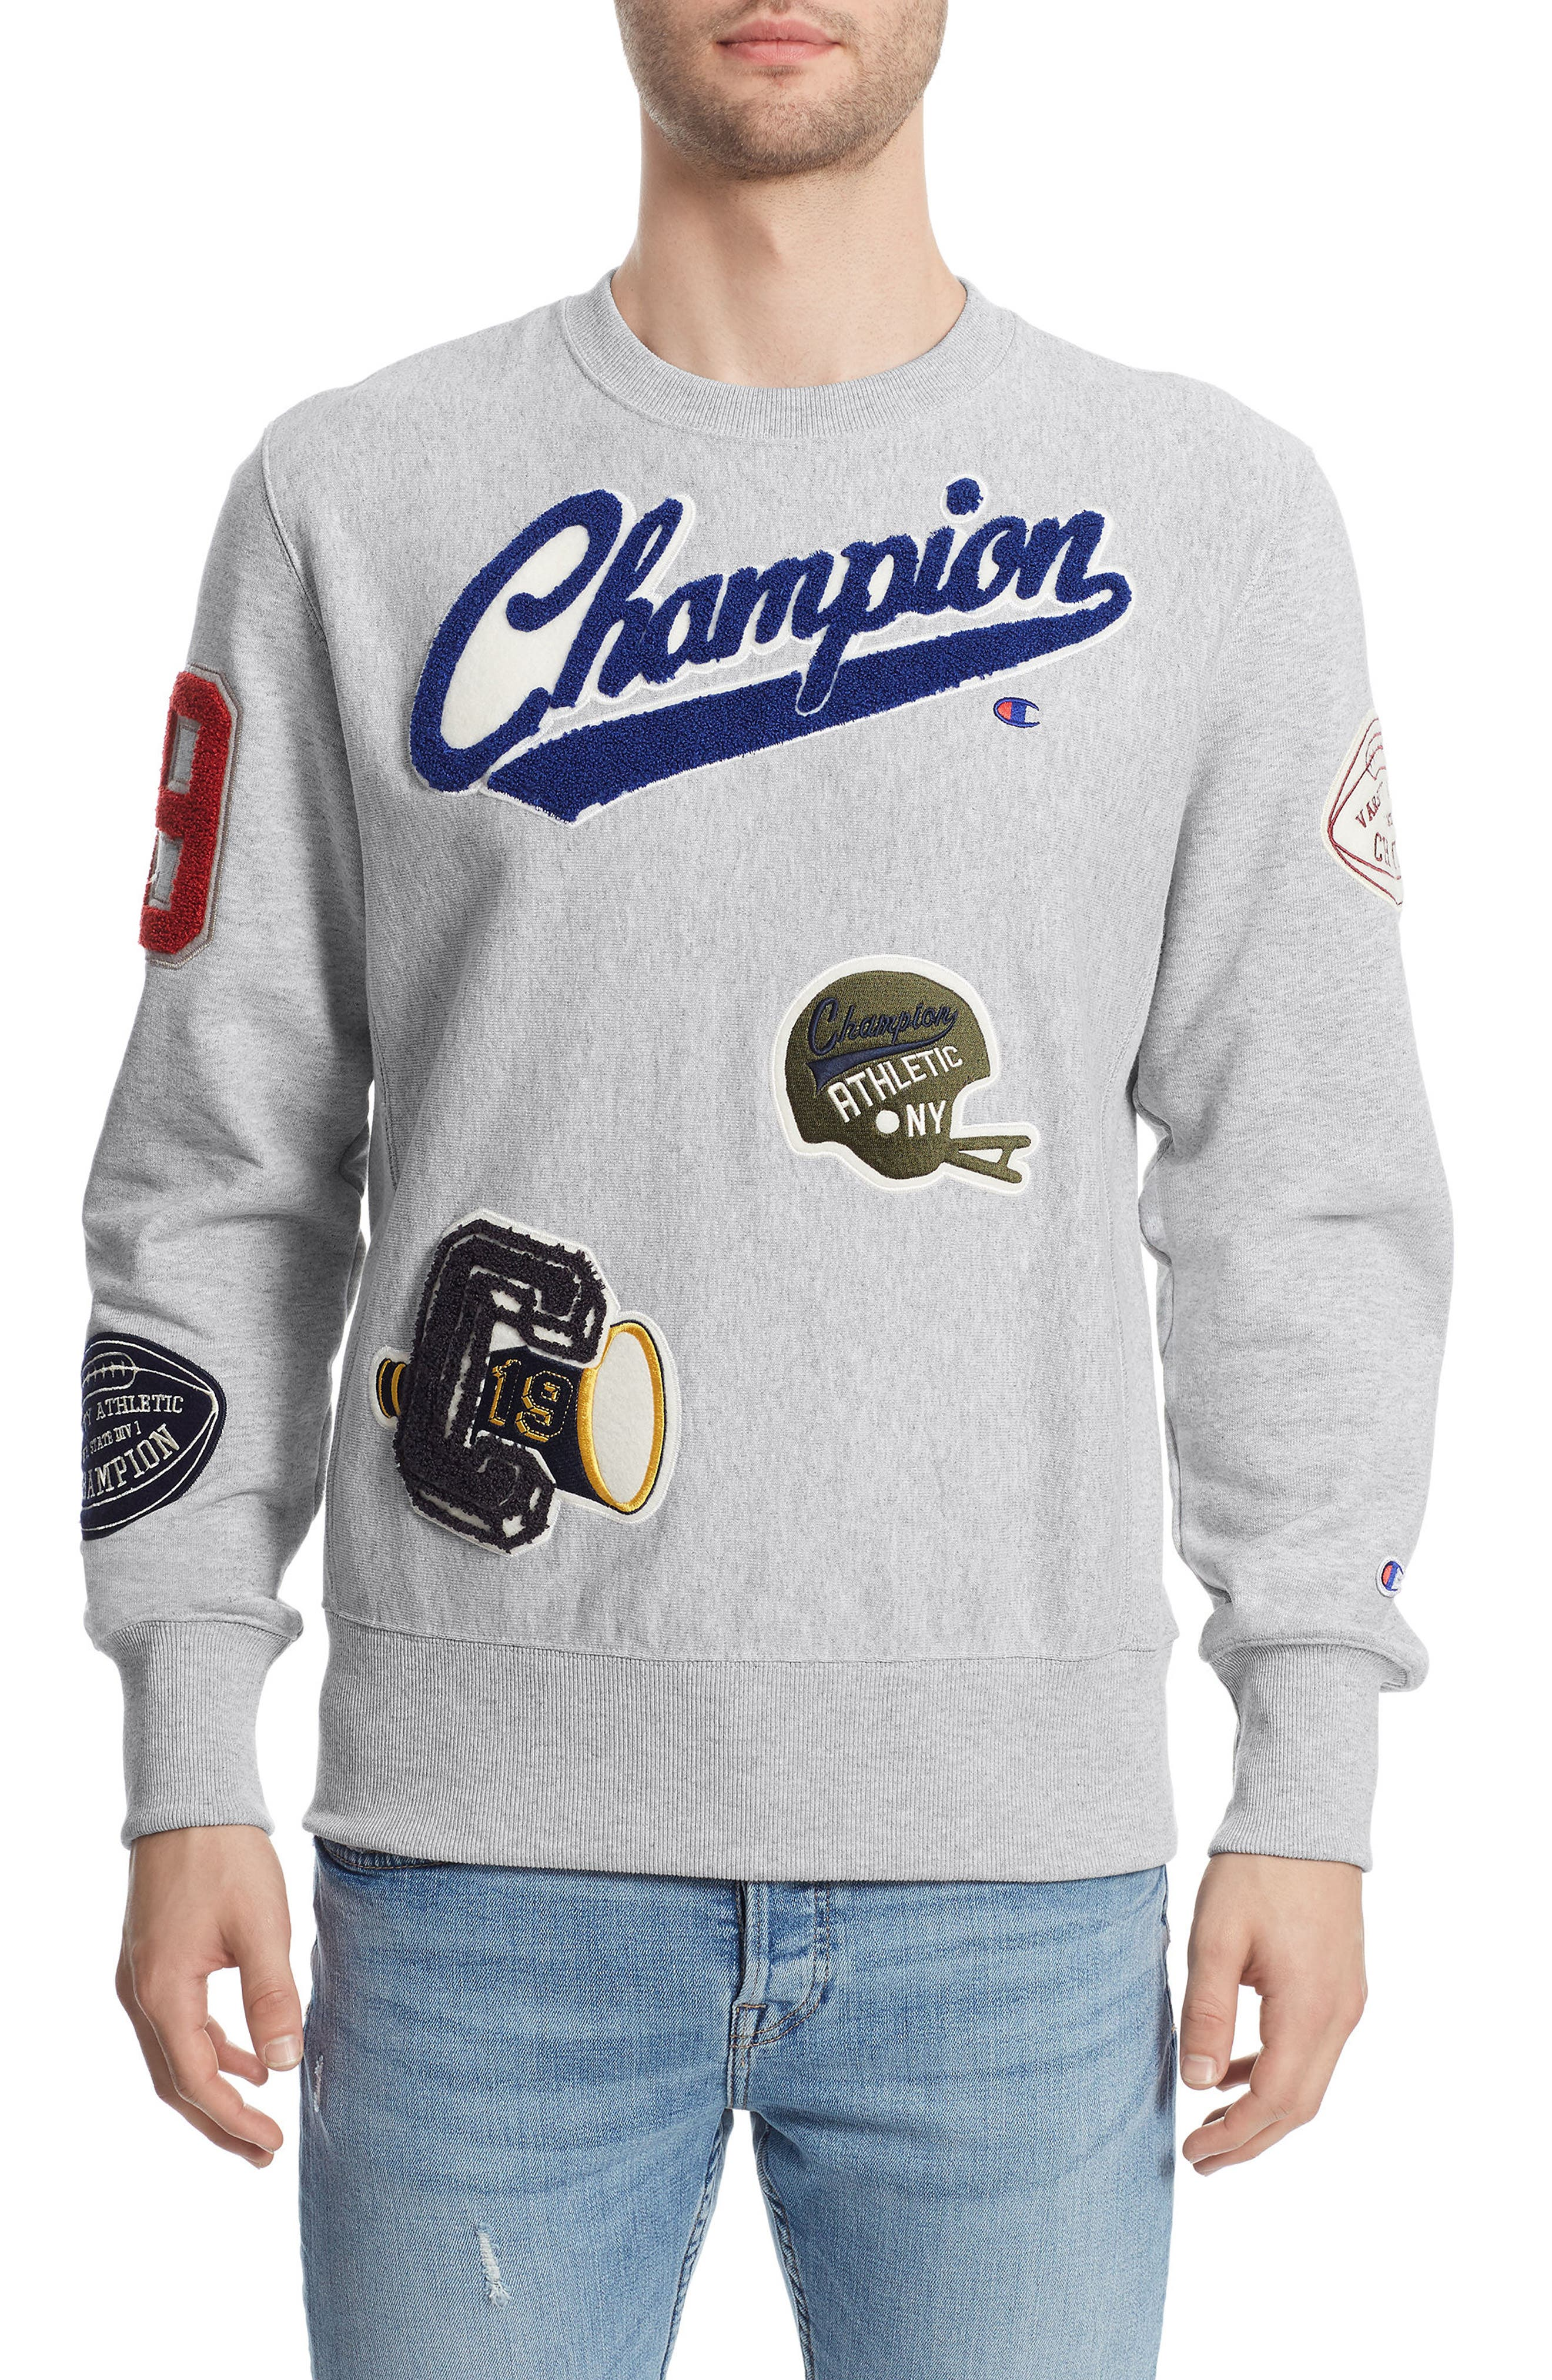 Alternate Image 1 Selected - Champion Reverse Weave® Patch Sweatshirt